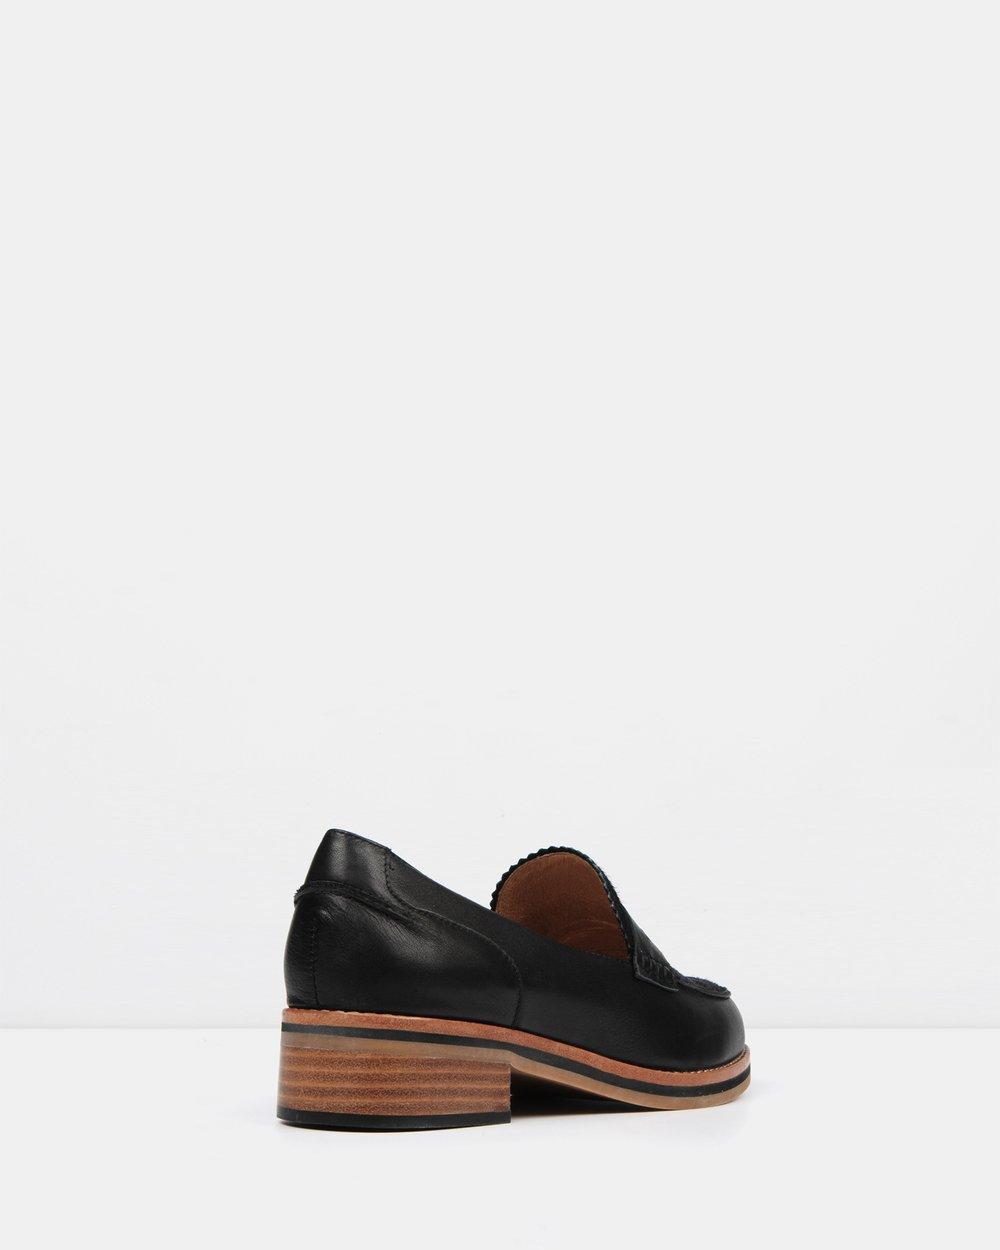 4dd82a1bb0 Desma Loafers by Jo Mercer Online